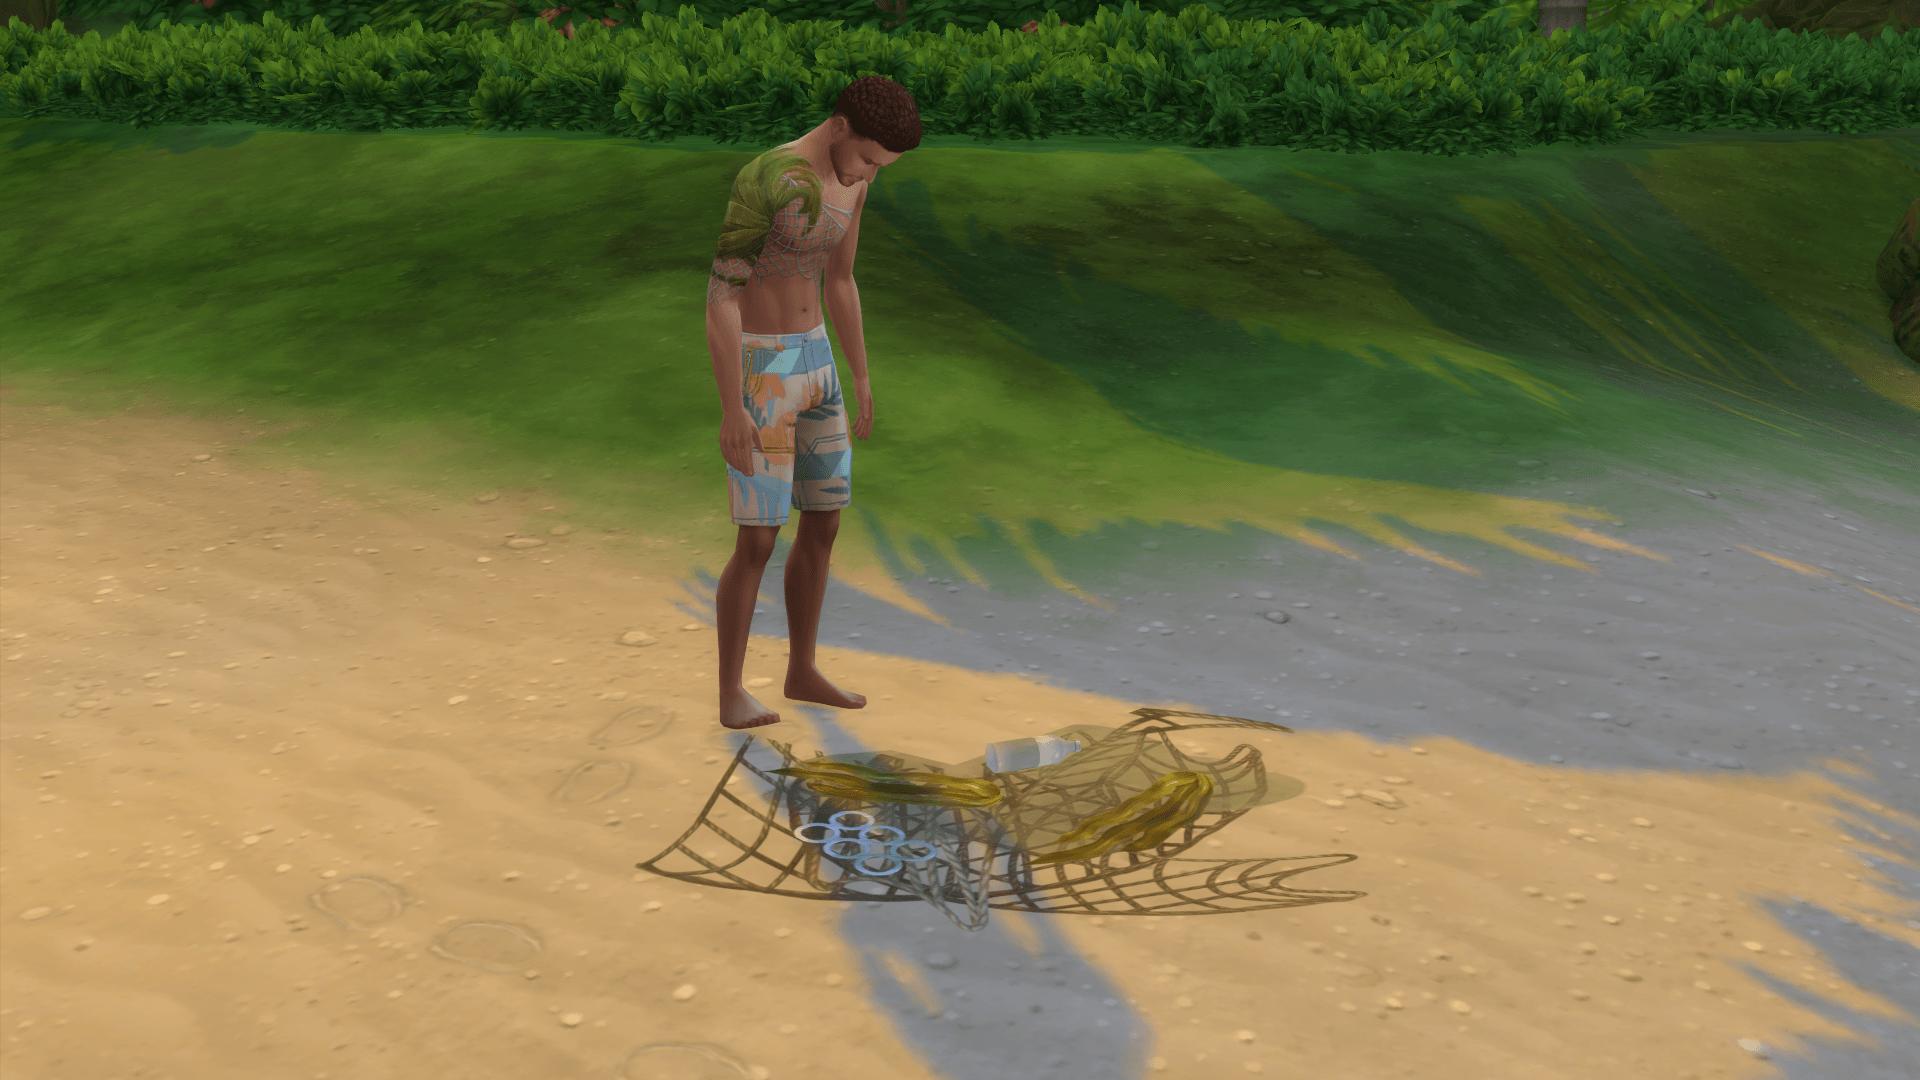 Nettoyer plage sulani sims 4 iles paradisiaques